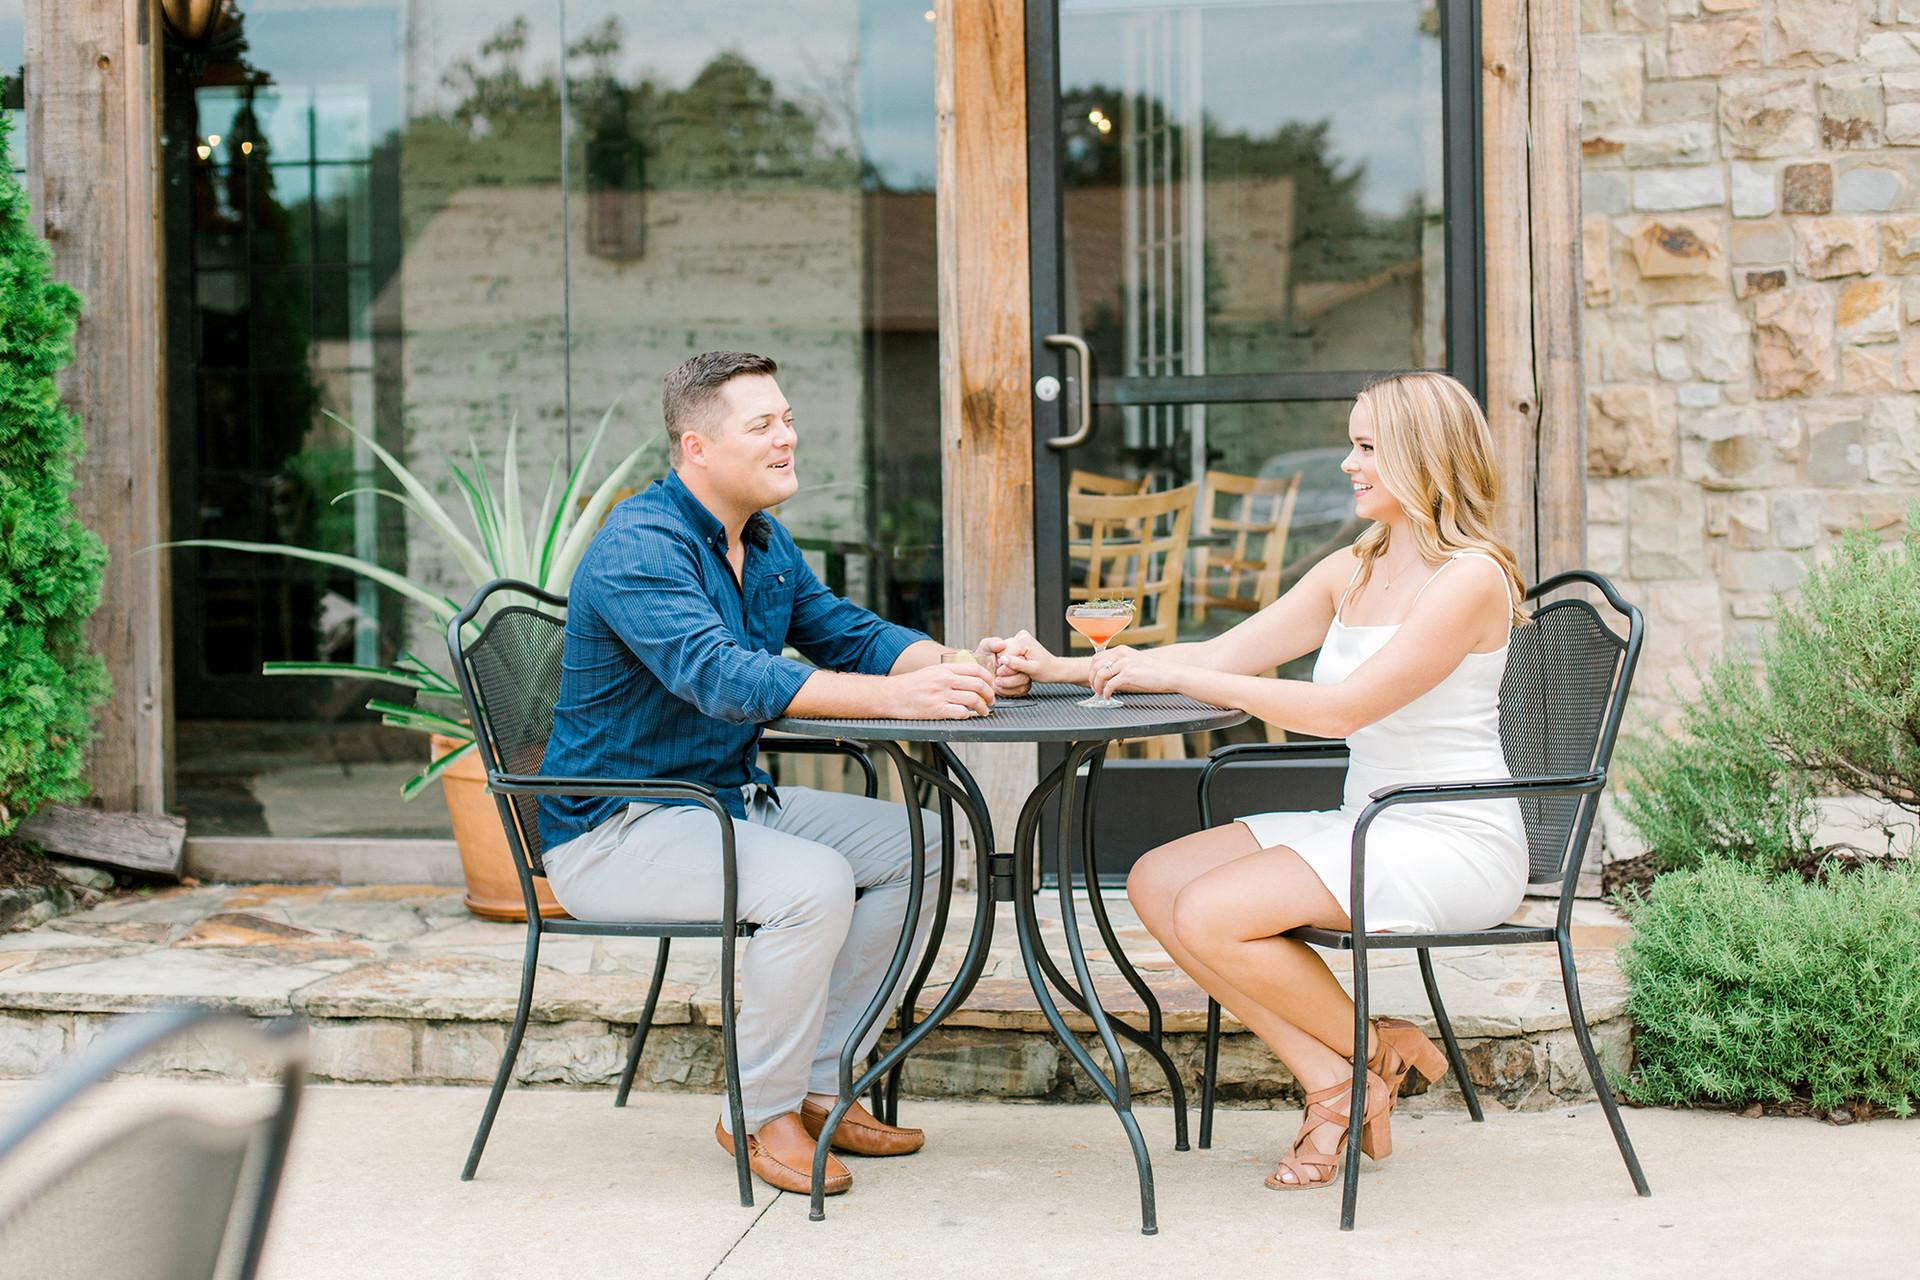 Josh + Jennifer Engagement Session at Acre Restaurant in Auburn, Alabama